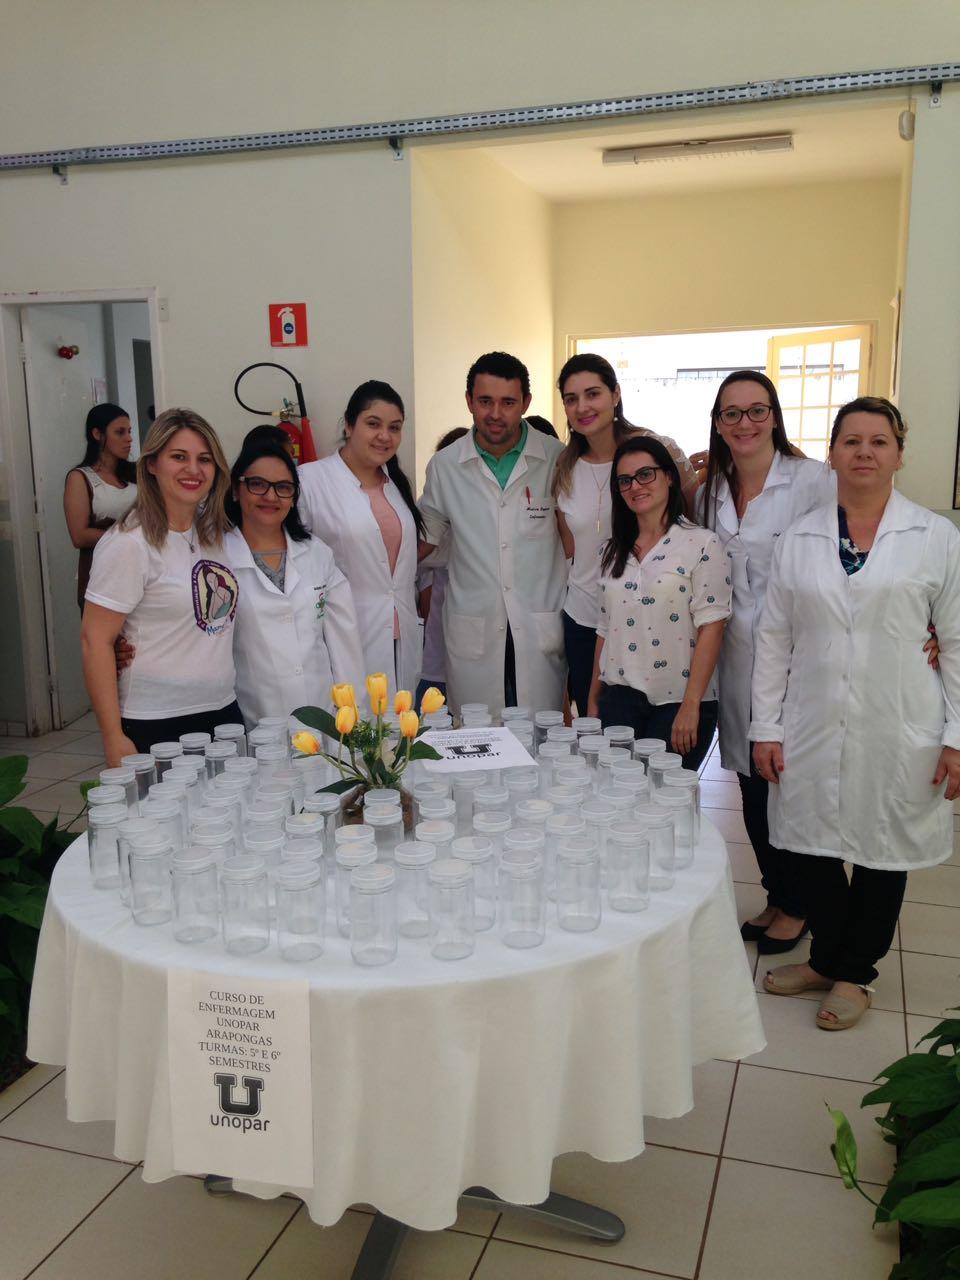 Curso de Enfermagem da Unopar entrega dezenas de potes de vidro ao Cisam